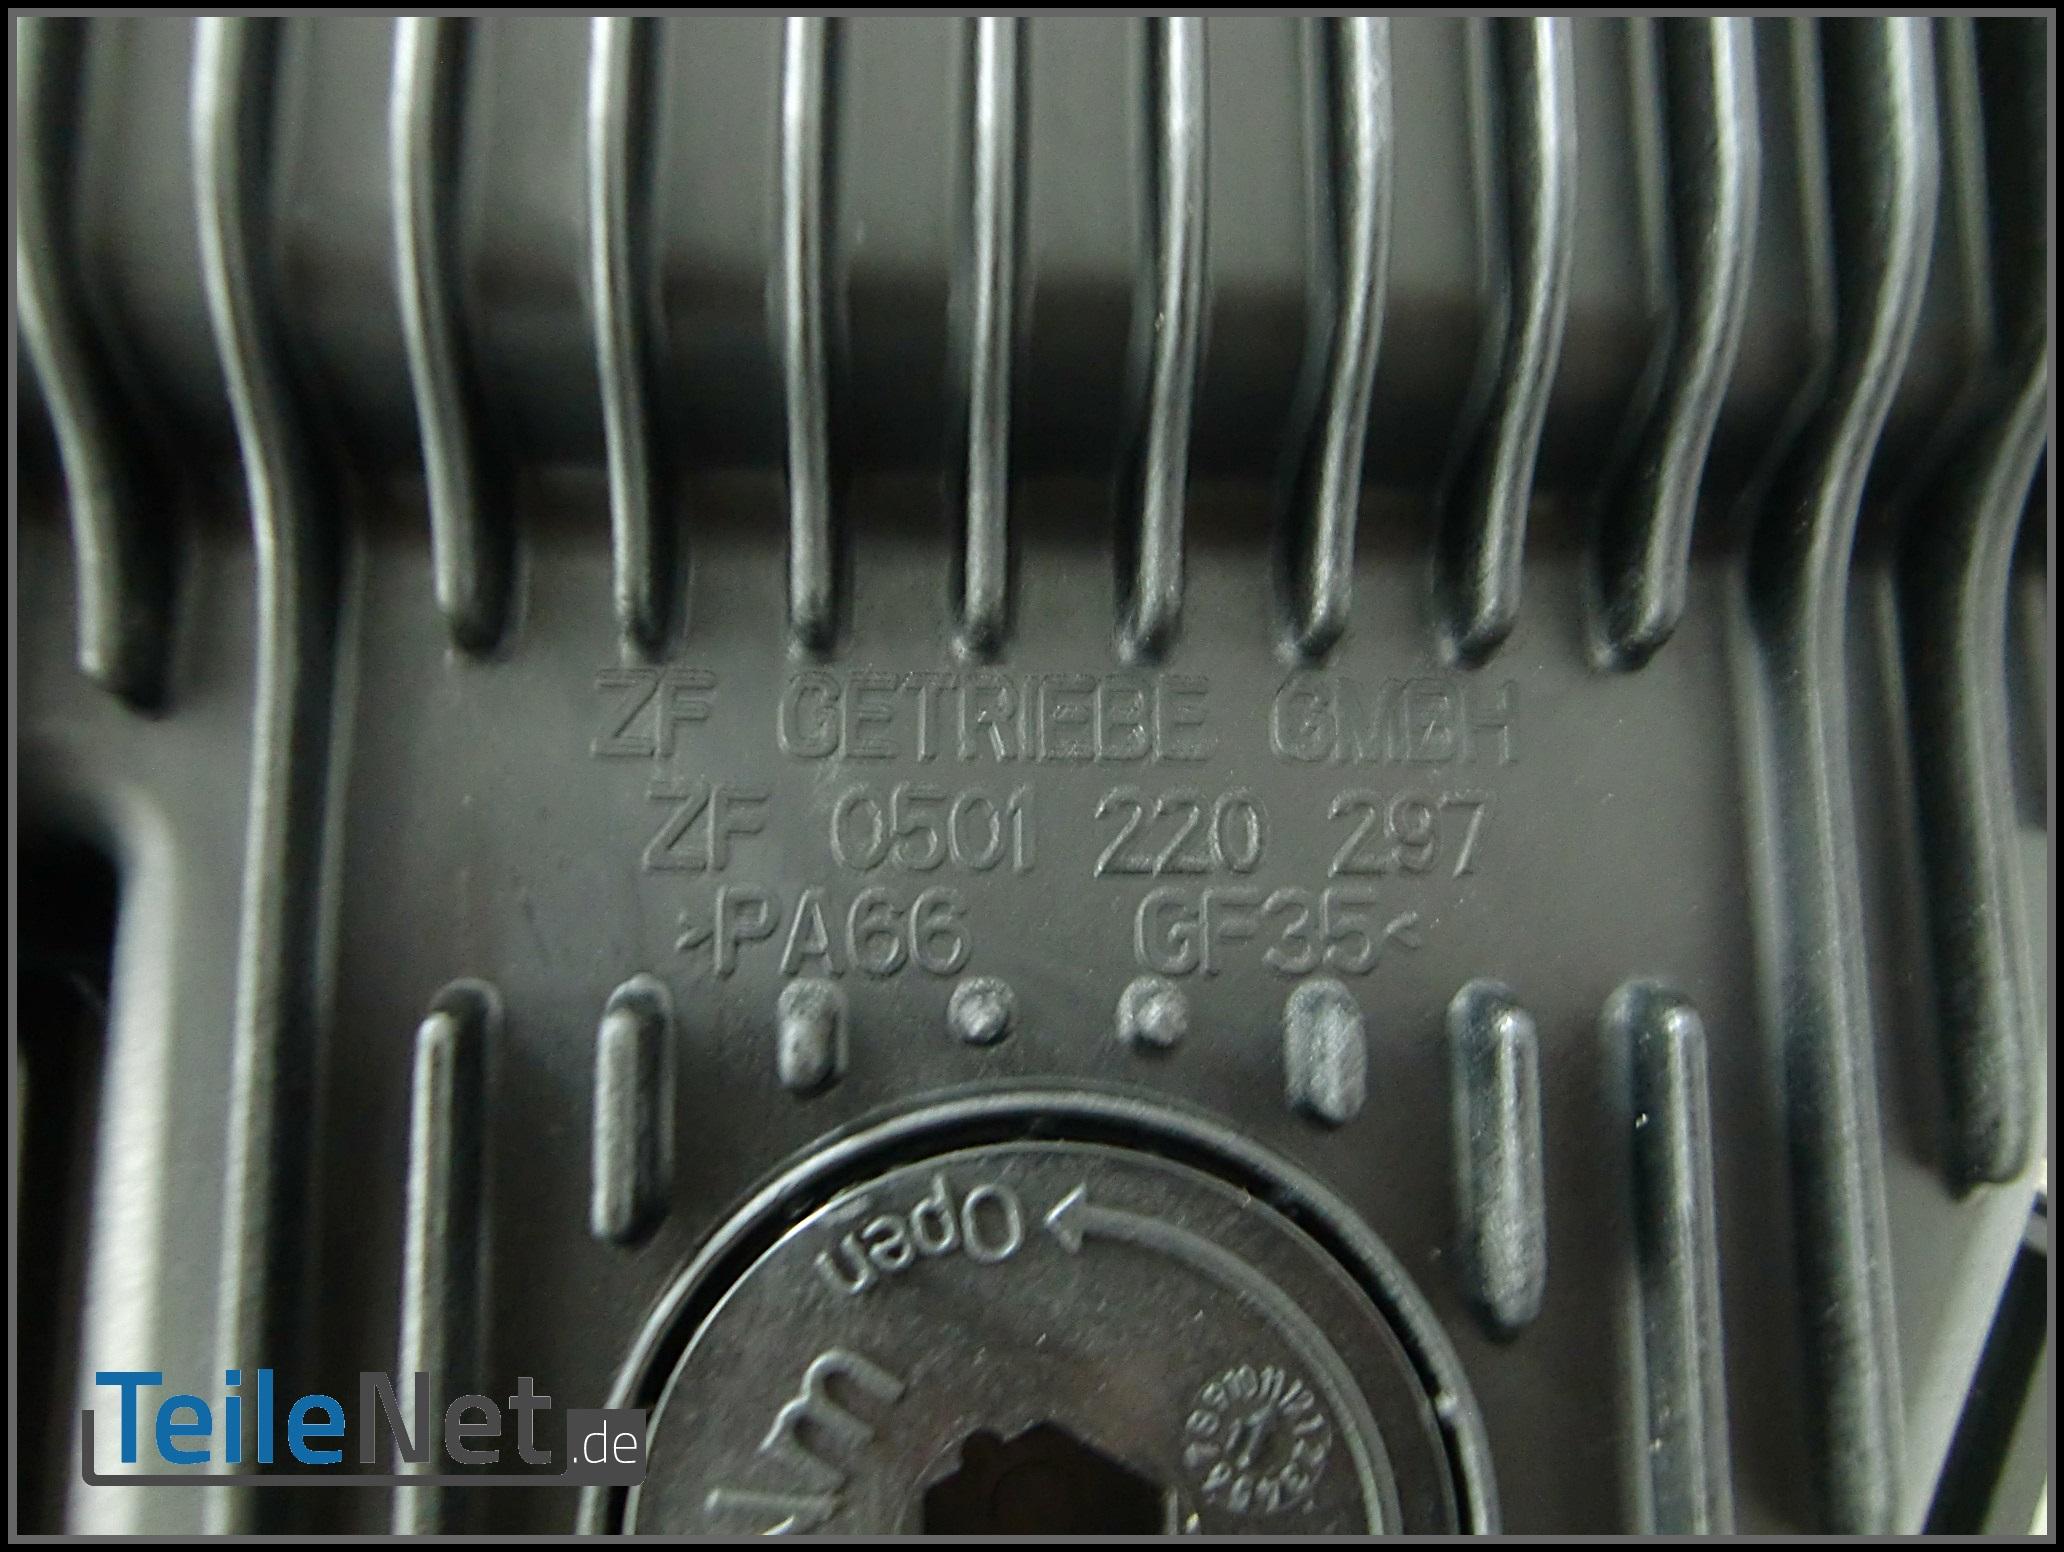 lwanne getriebe bmw original zf automatikgetriebe. Black Bedroom Furniture Sets. Home Design Ideas